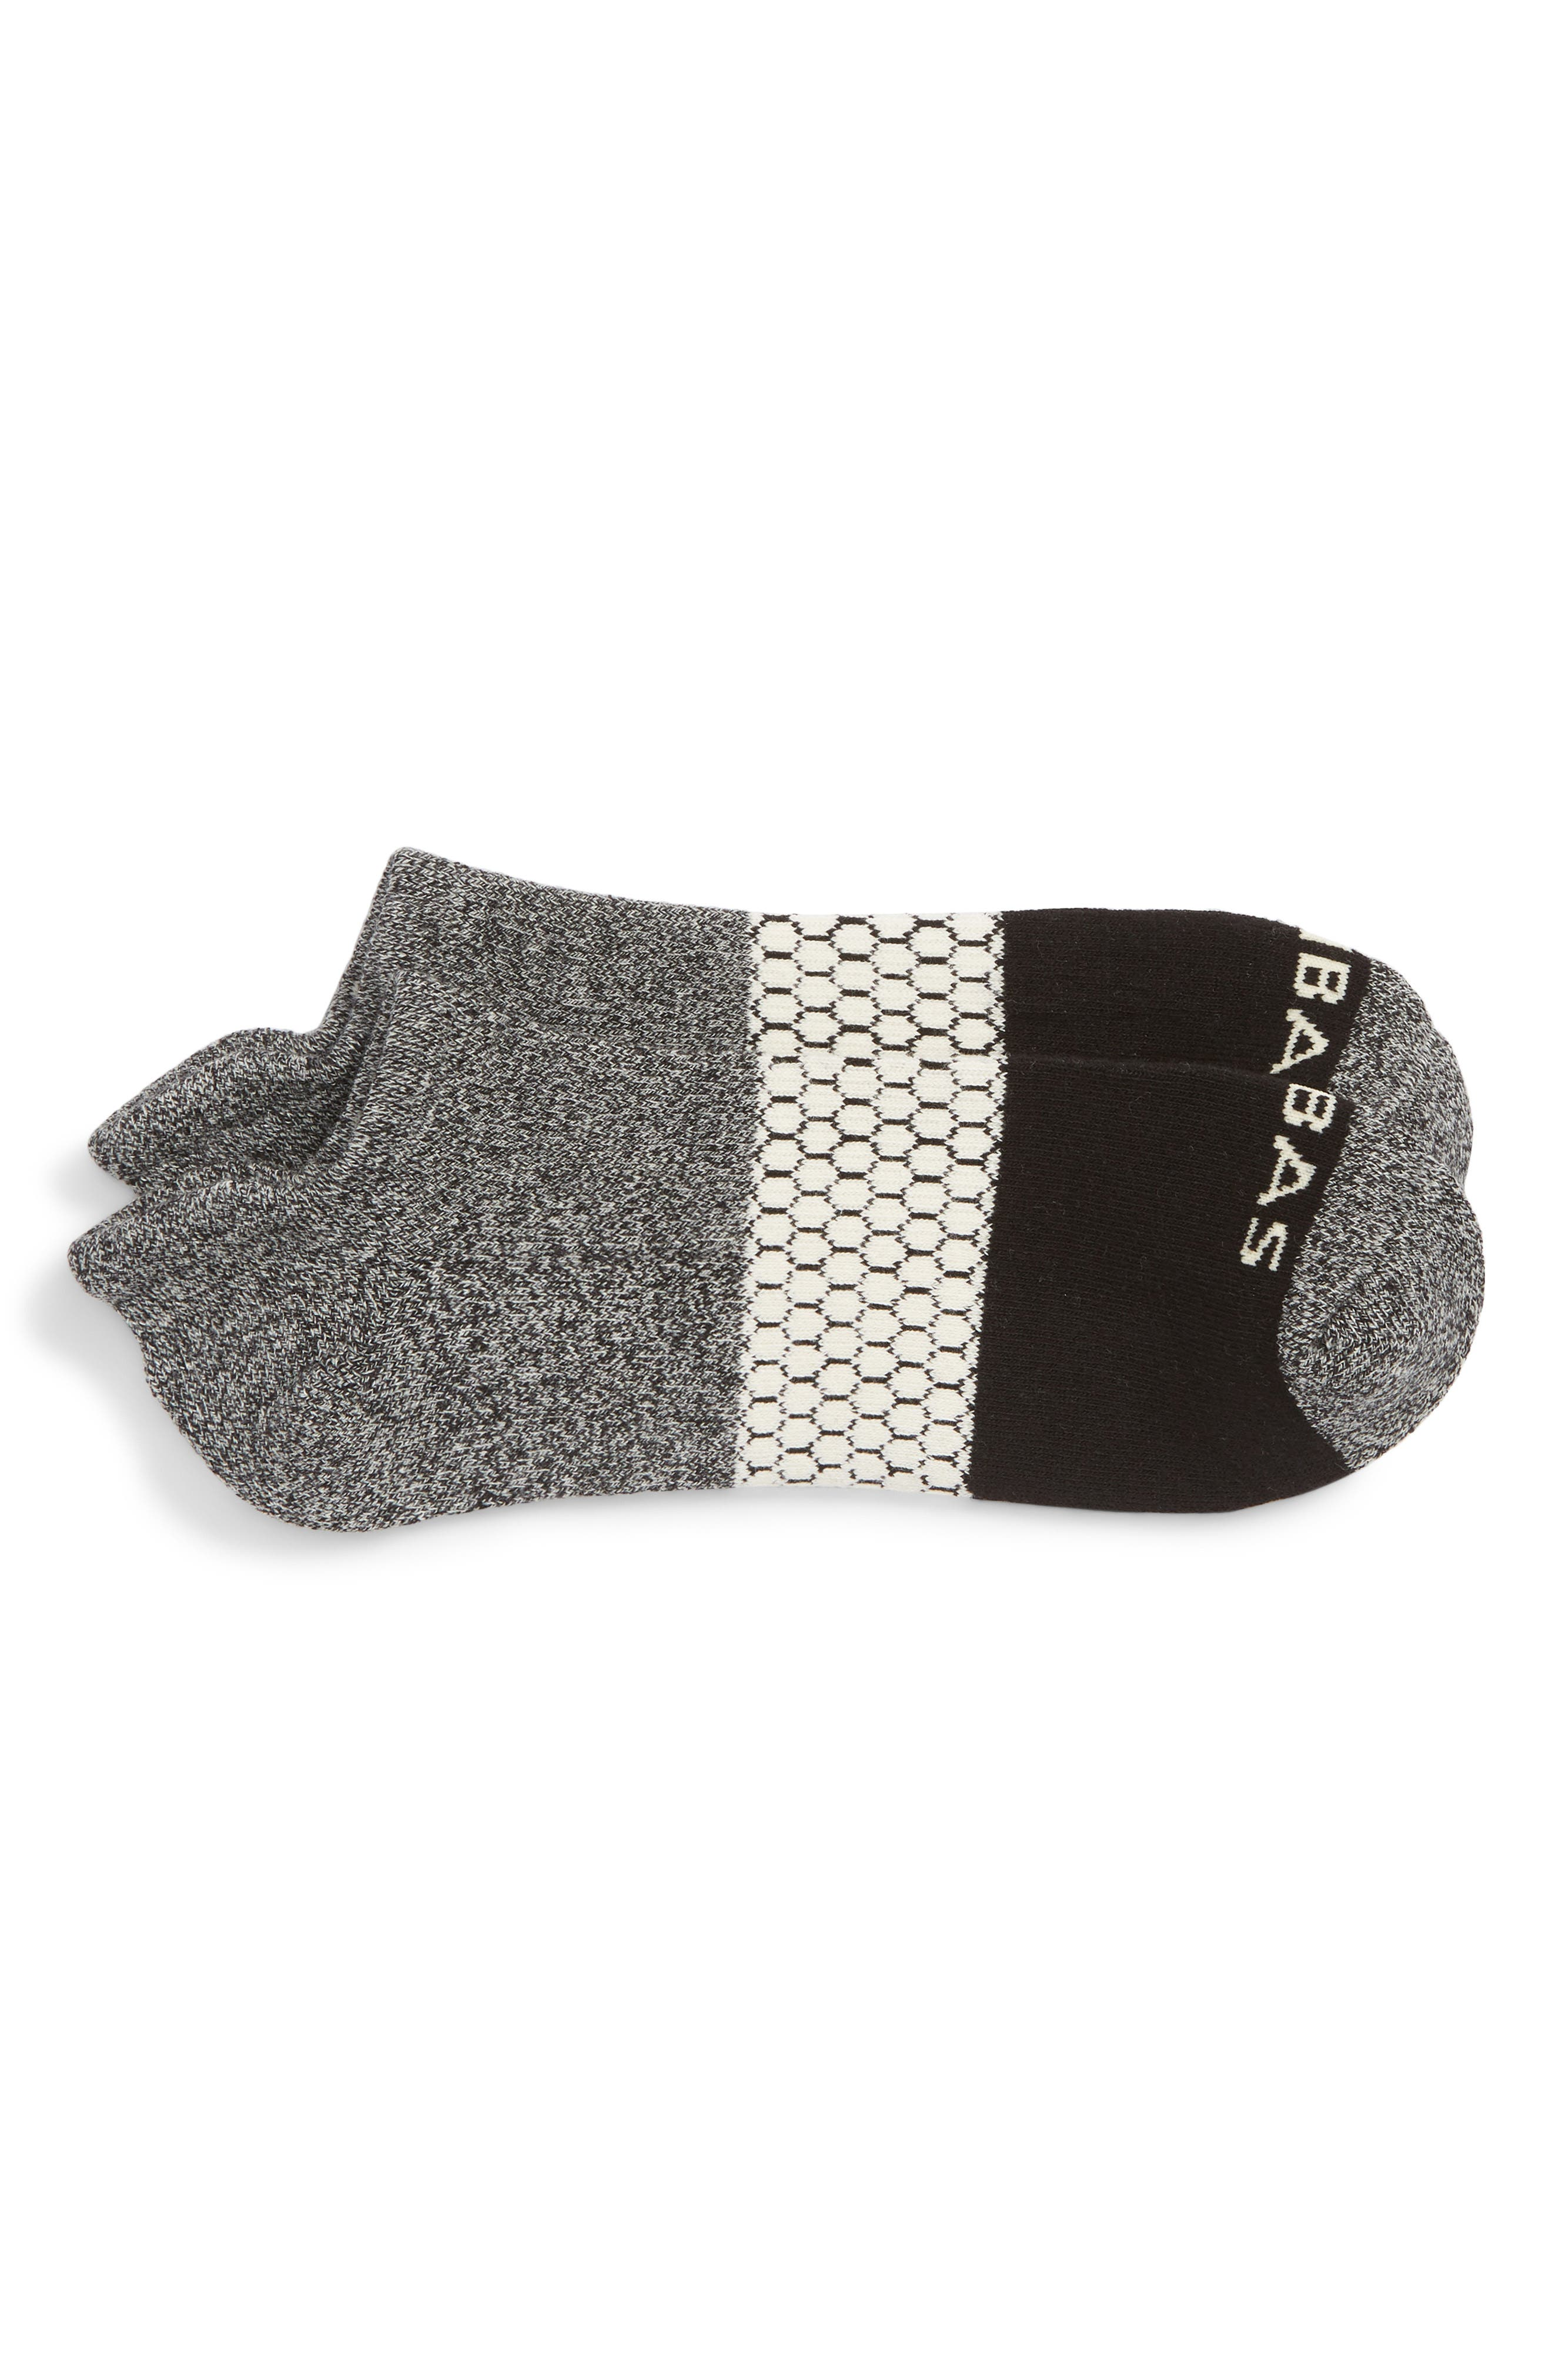 Colorblock Ankle Socks